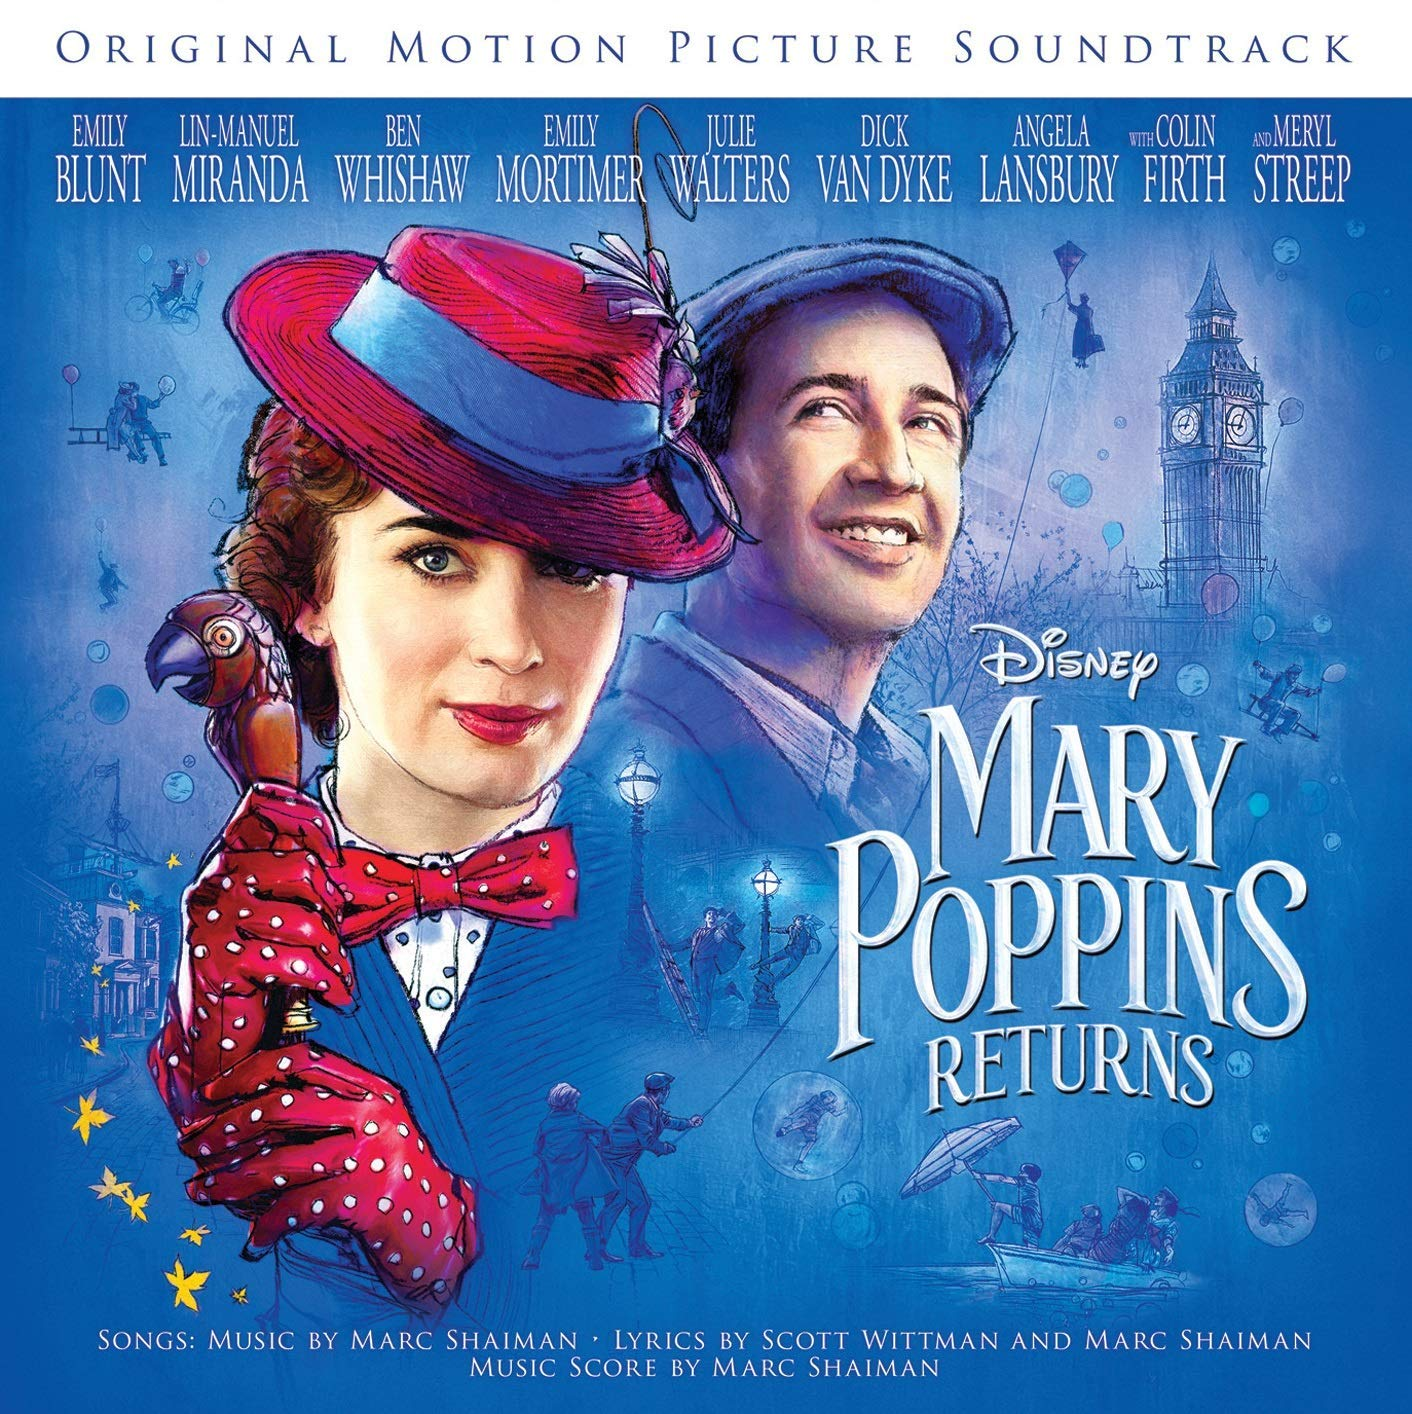 bande originale soundtrack ost score retour returns mary poppins disney